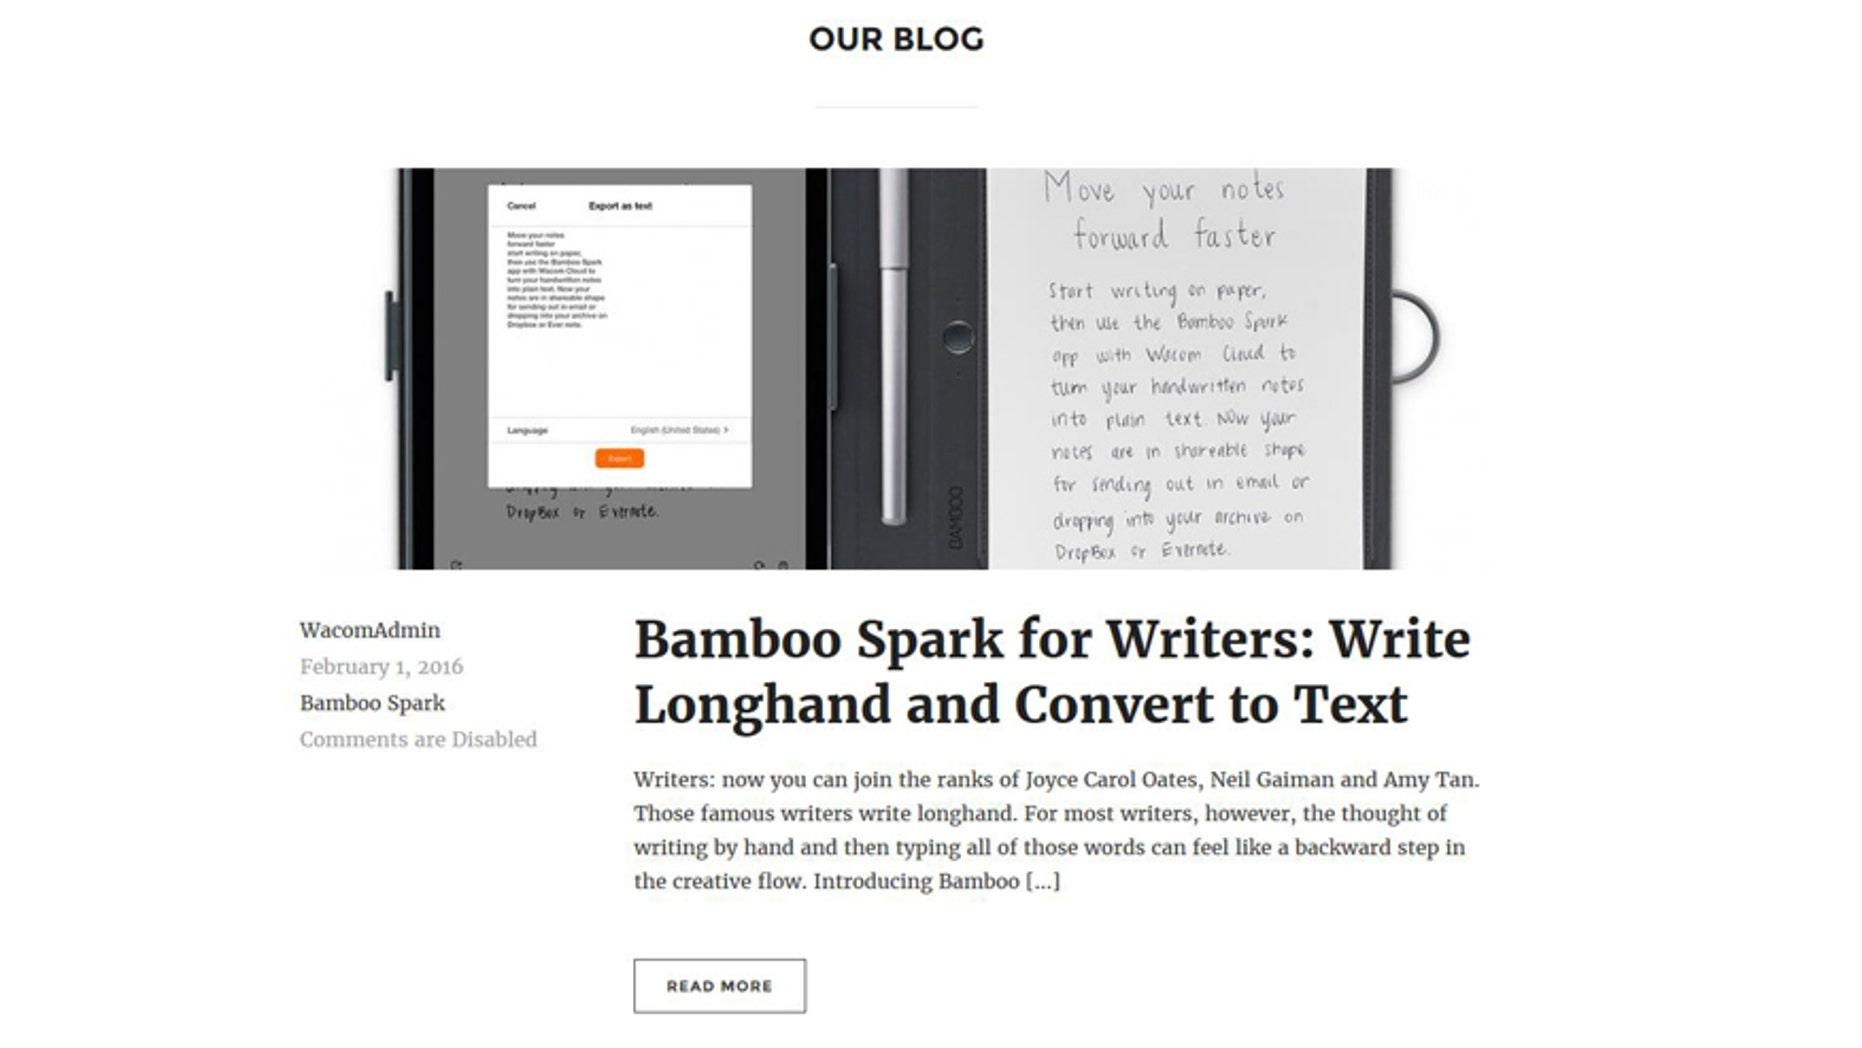 (Screenshot from http://bamboo.wacom.com/)